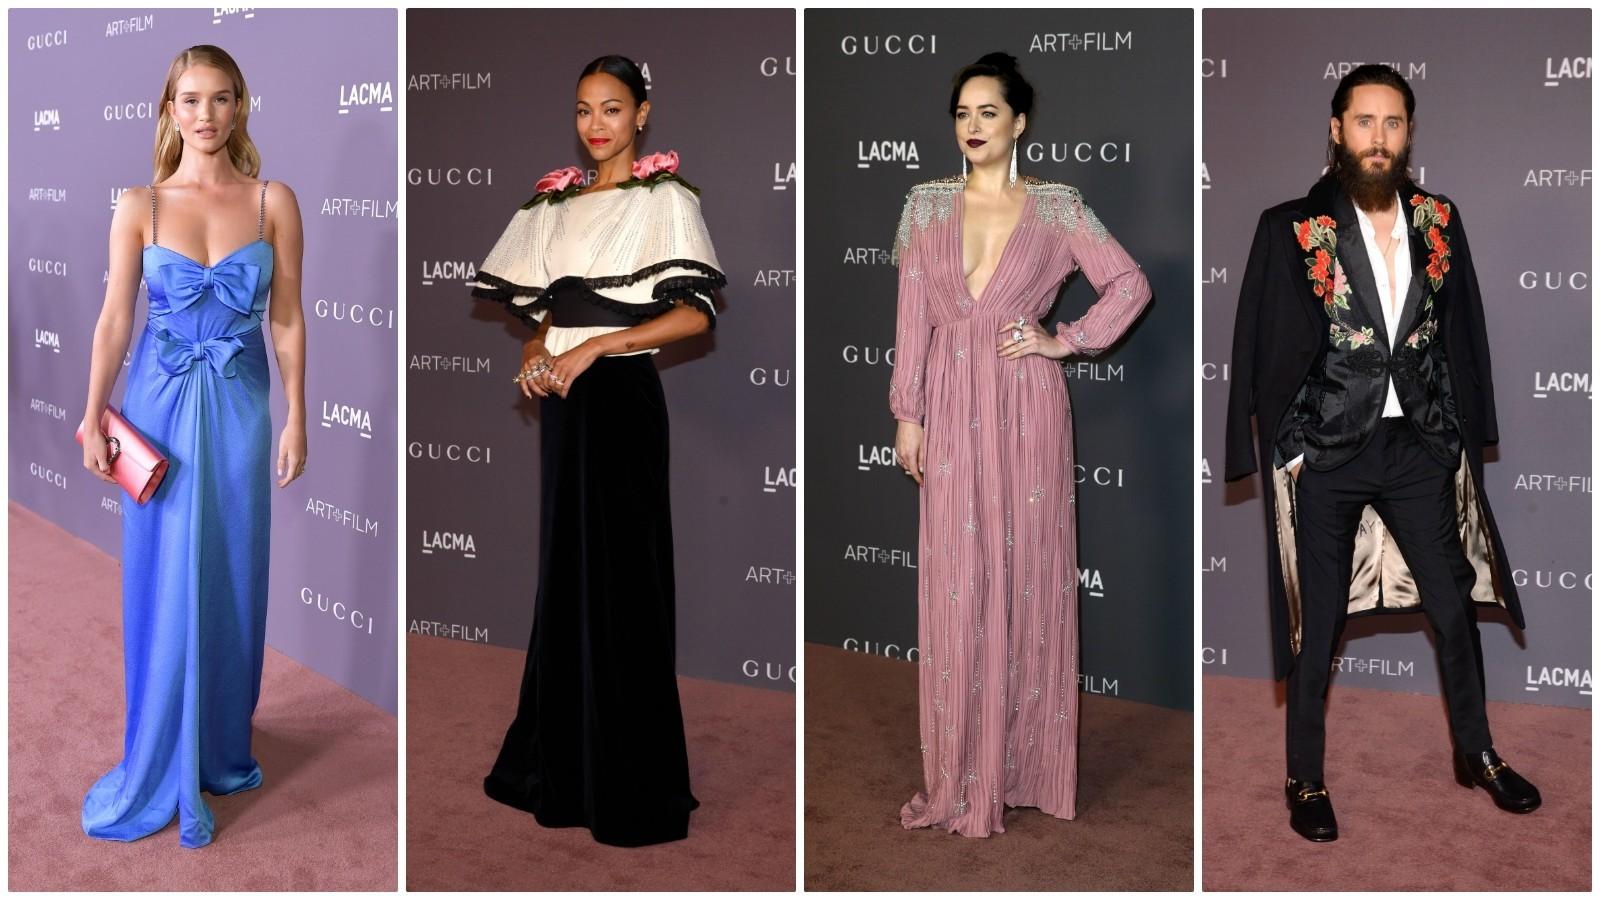 Gucci at the 2017 LACMA Art + Film Gala